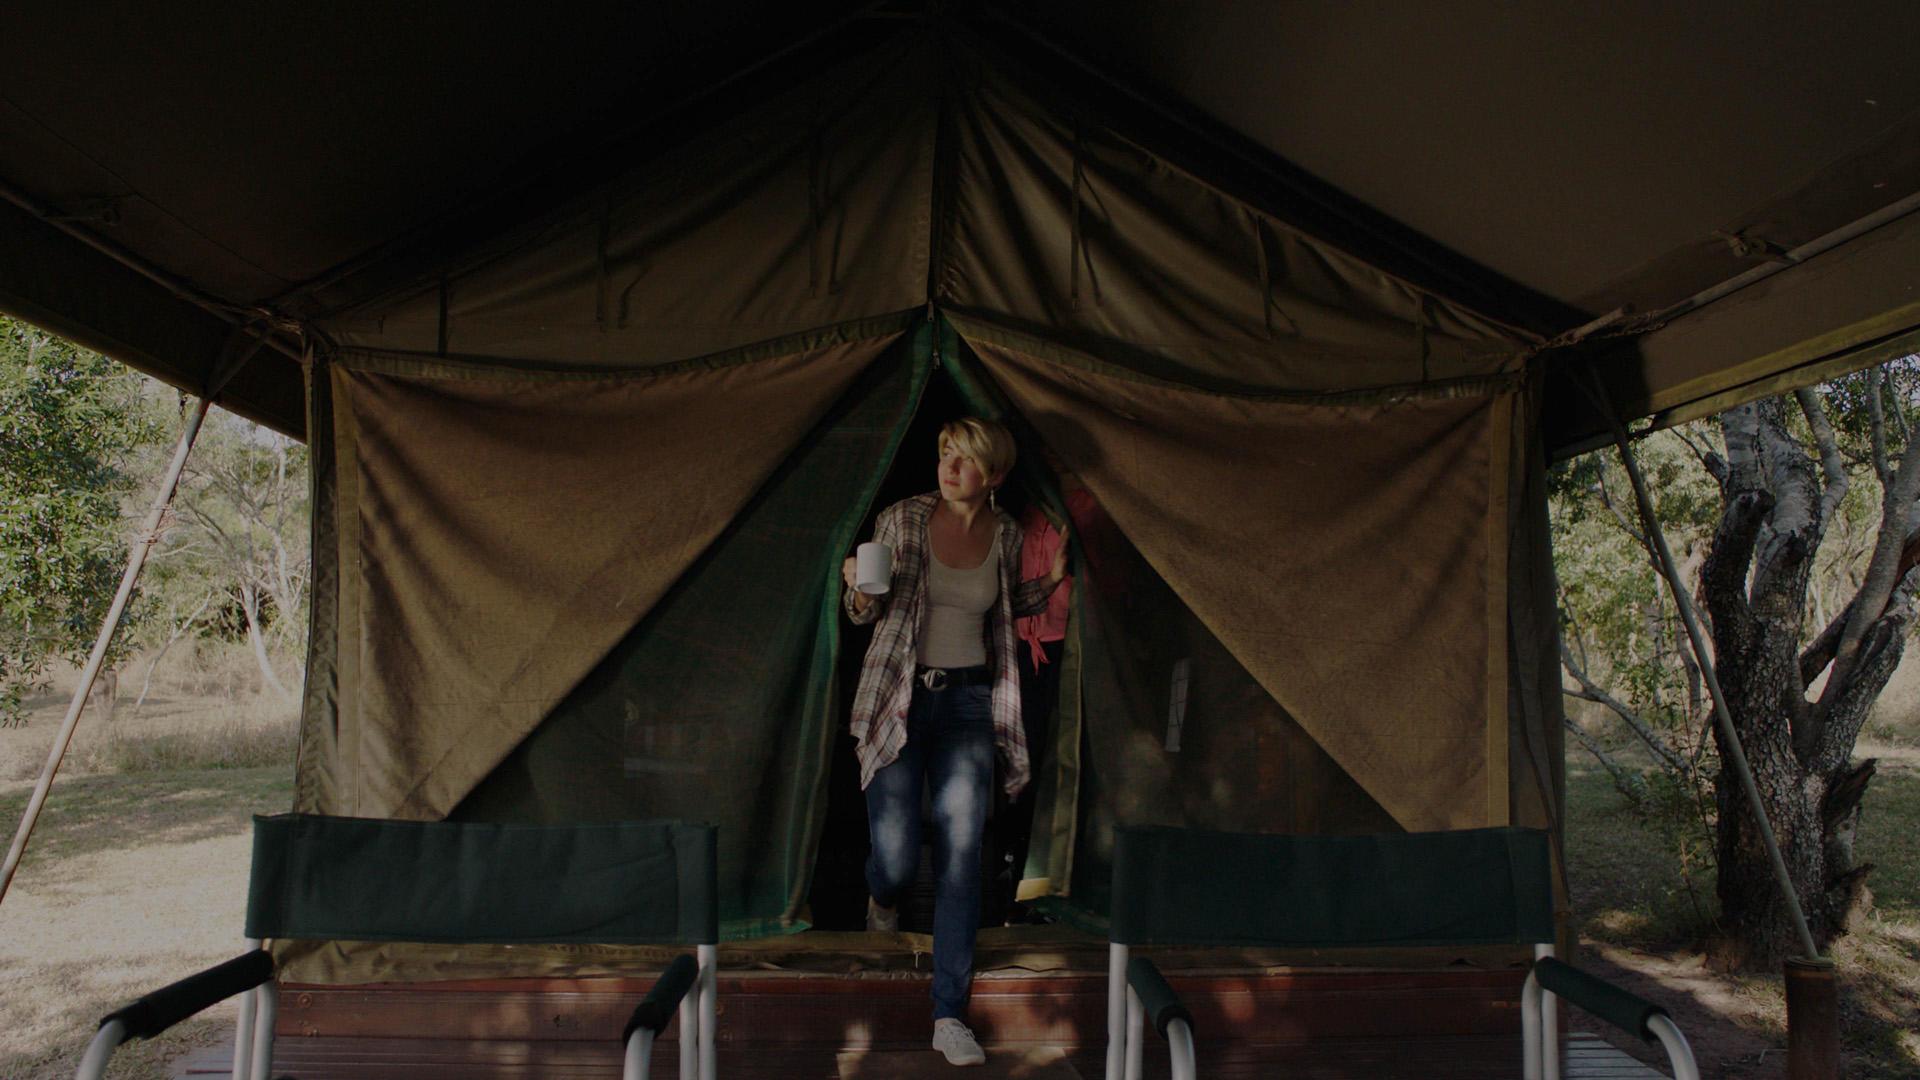 Tent 1 resize